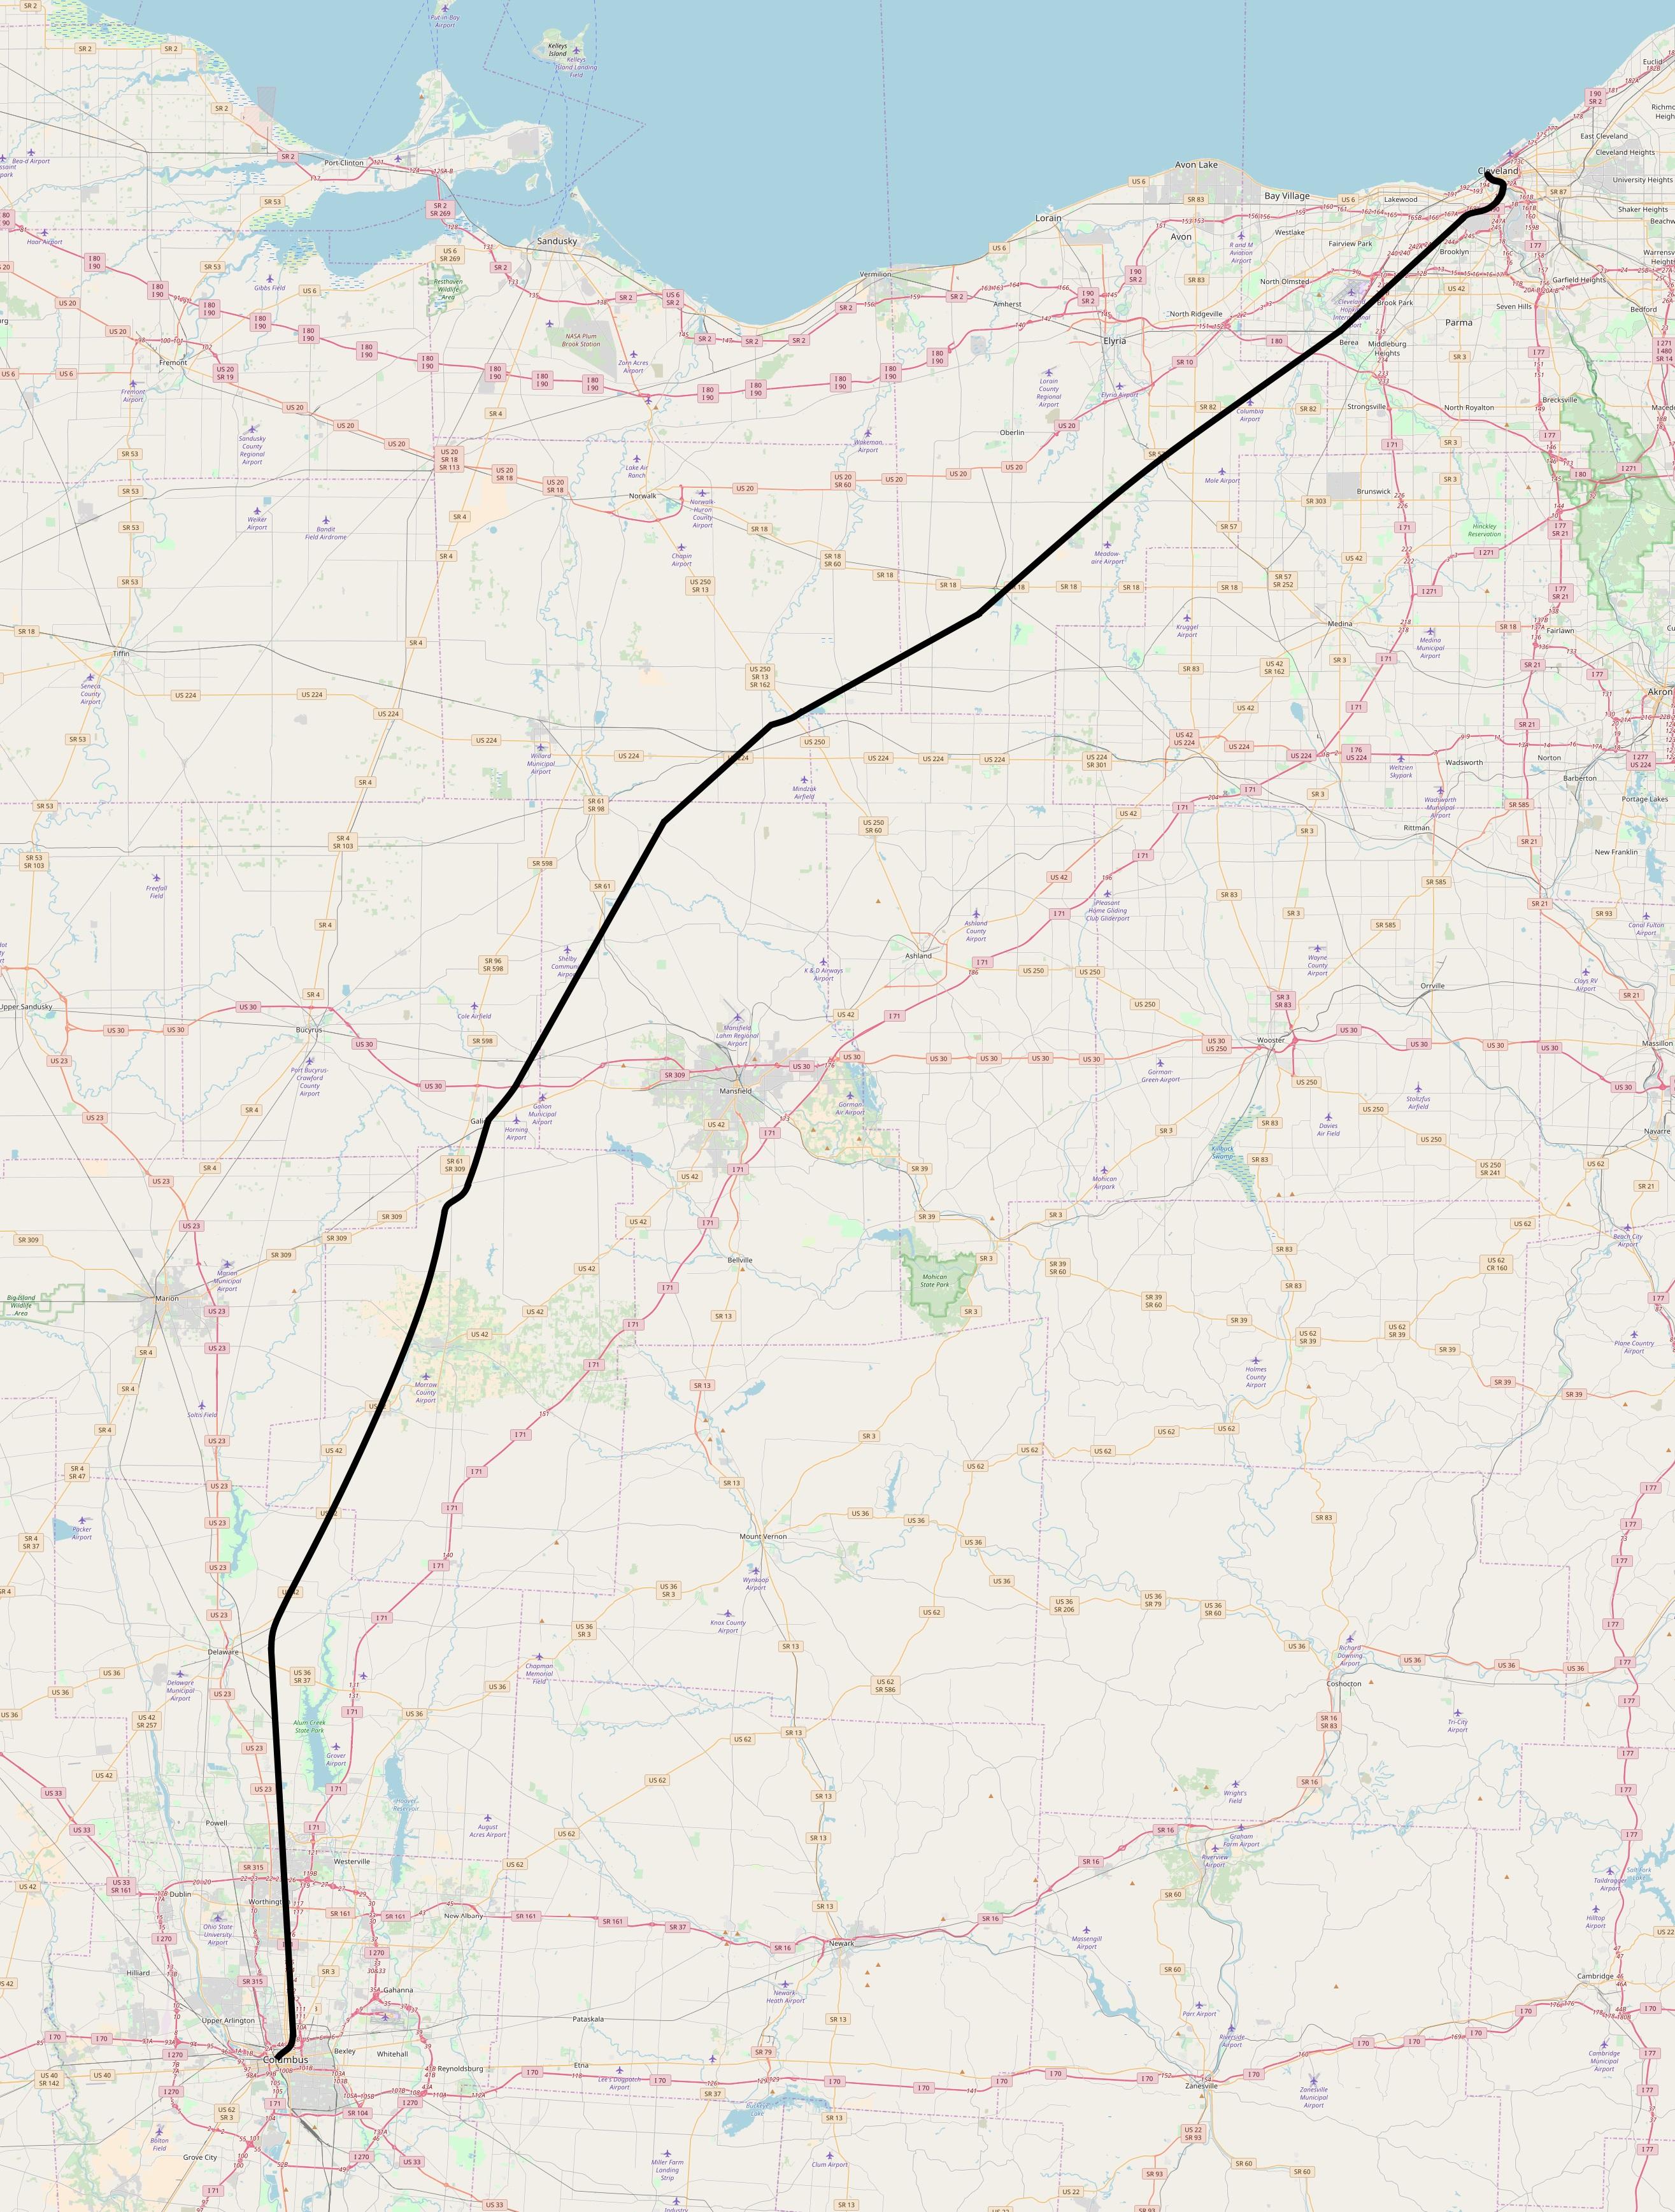 OHIO 1819 OH MAP Marion Galion Shelby Upper Sandusky HISTORY LARGE